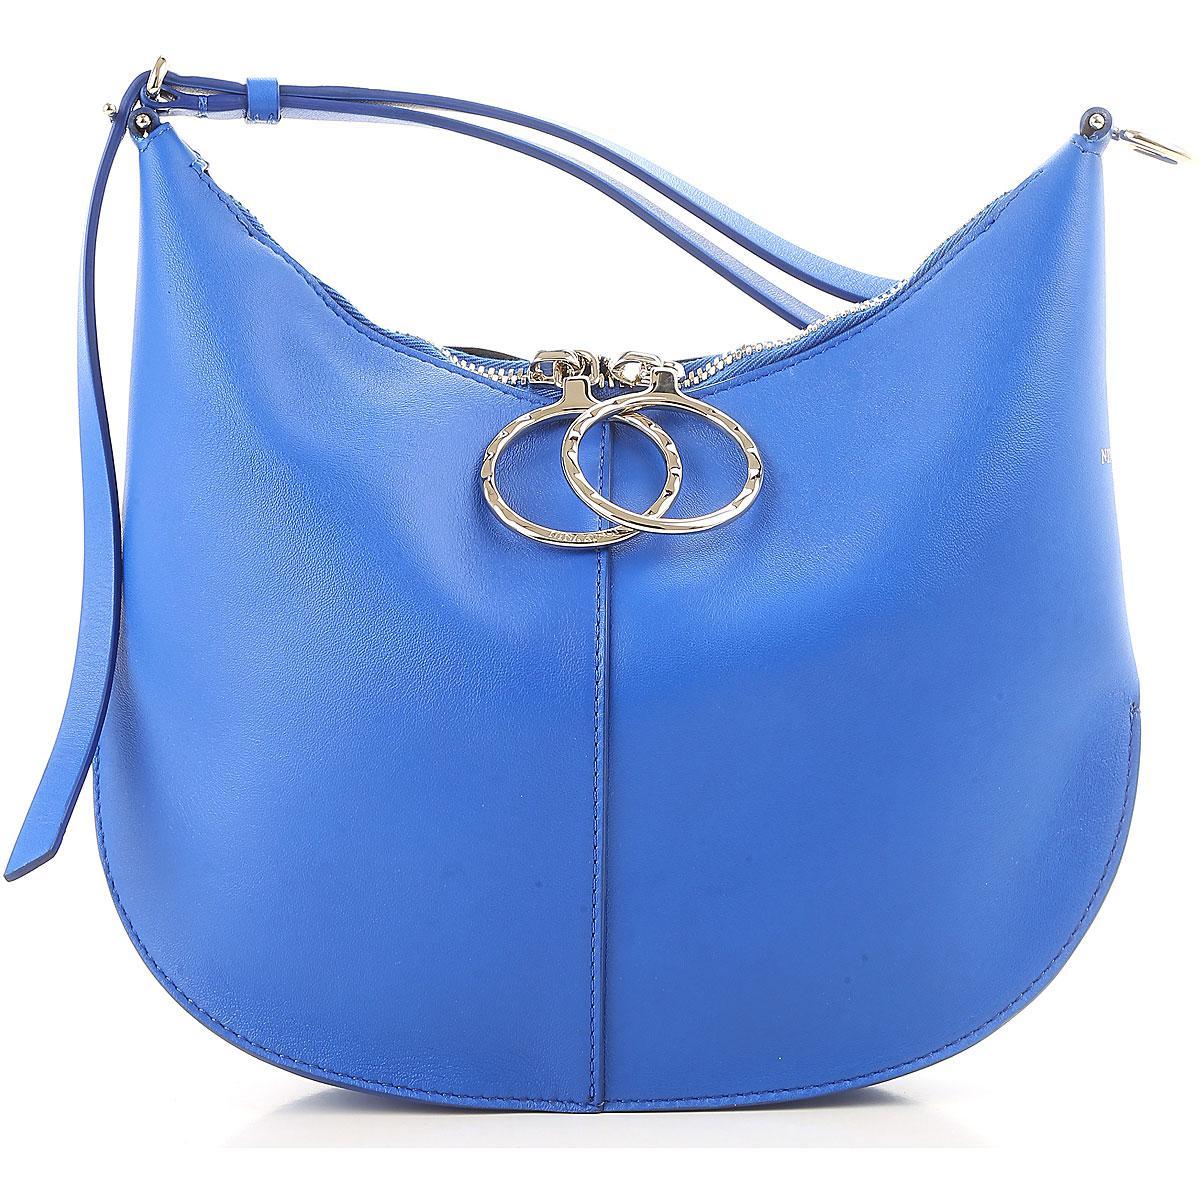 d410658b4e Sac à main Pas cher en Soldes Nina Ricci en coloris Bleu - Lyst